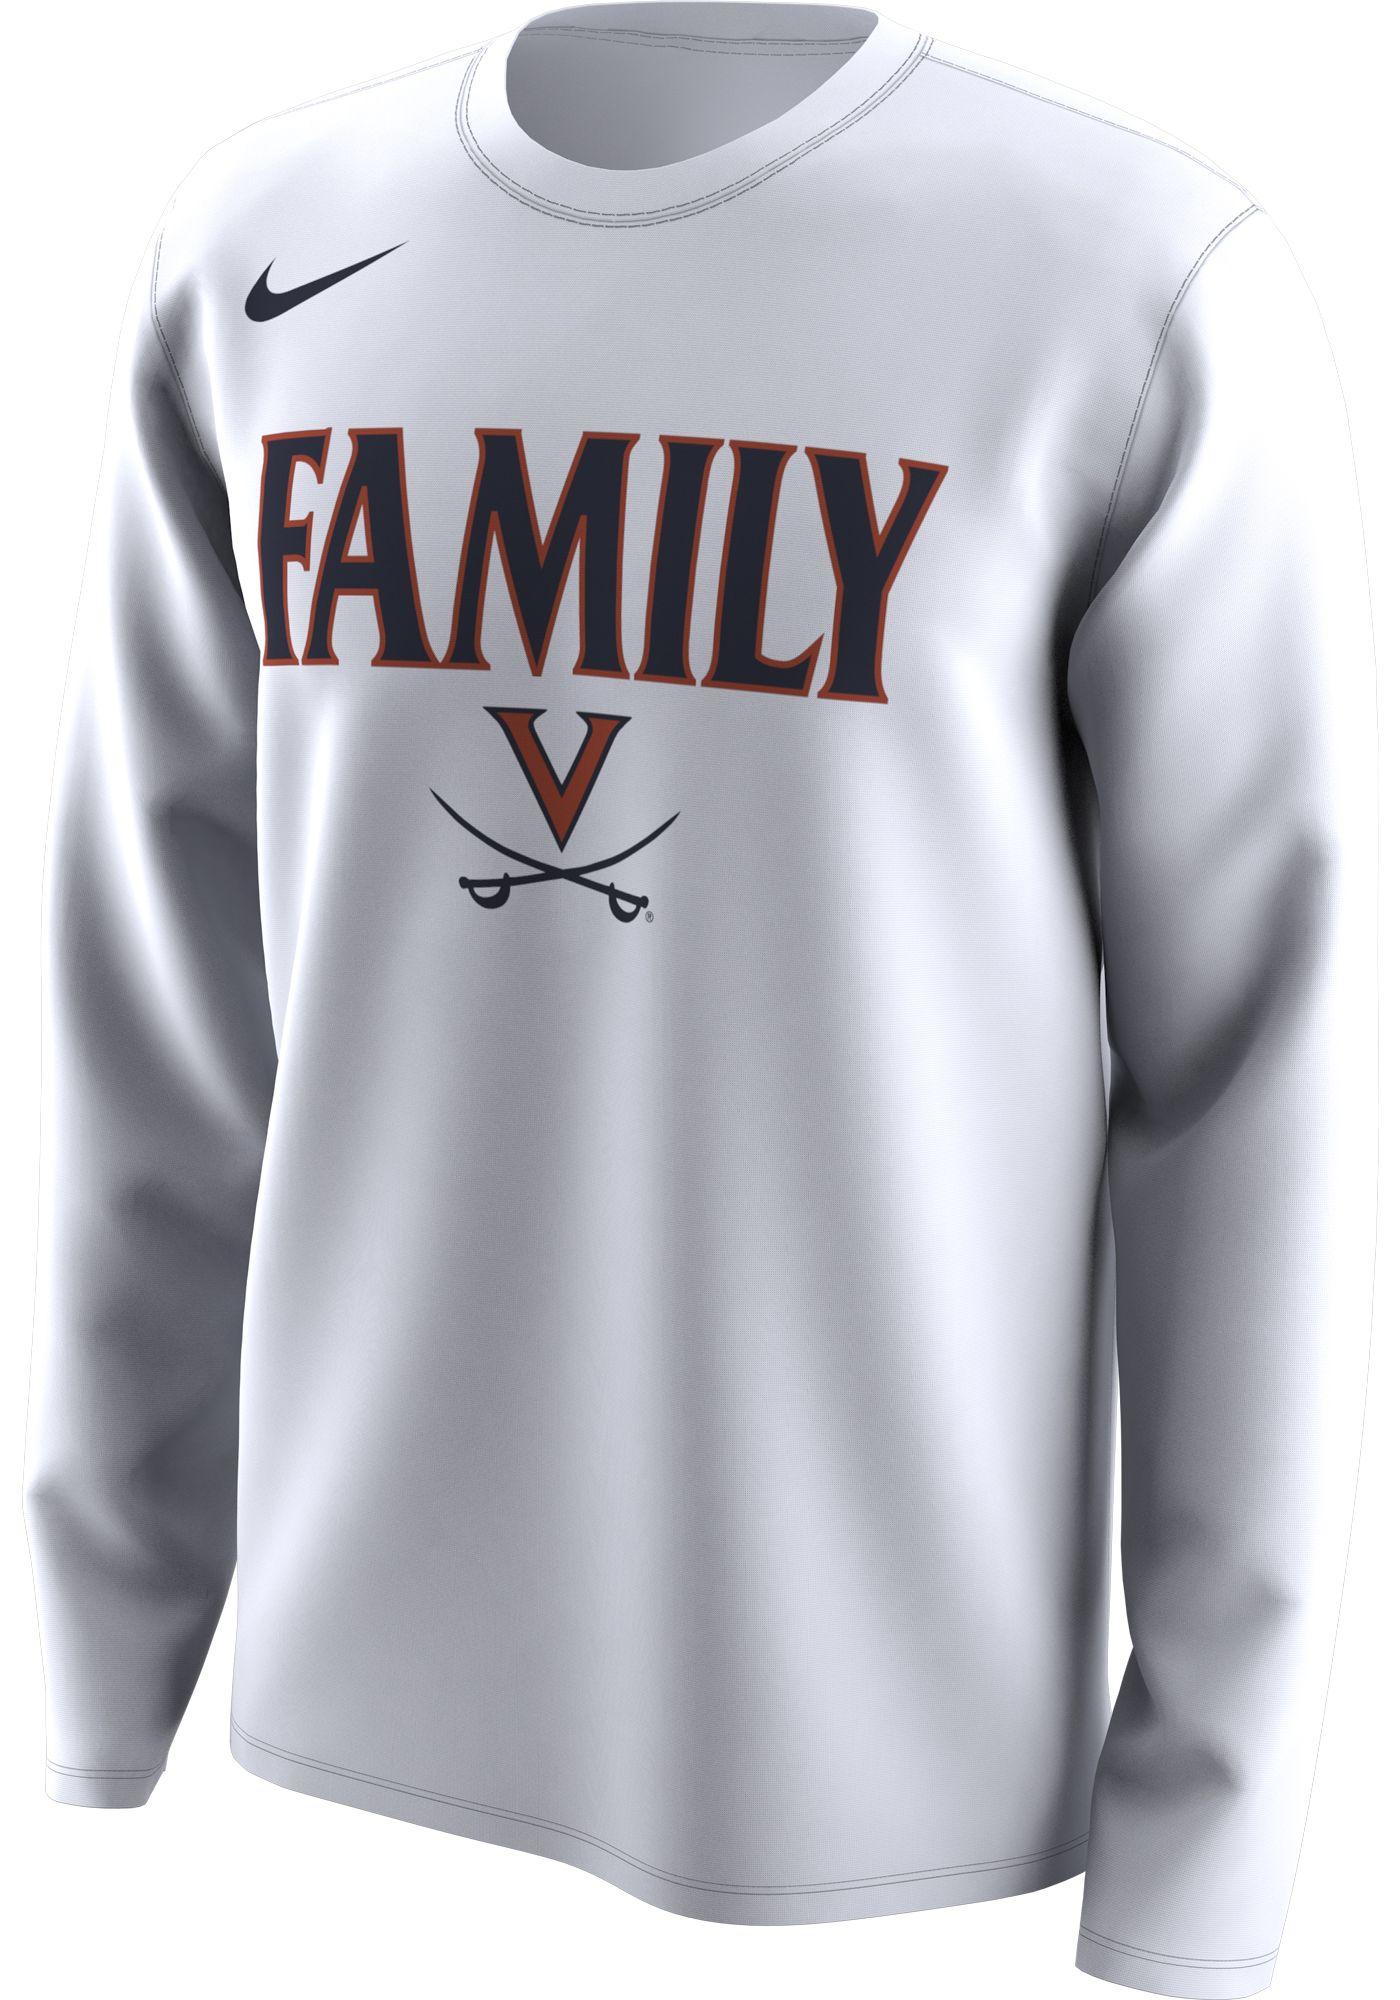 Nike Men's Virginia Cavaliers 'Family' Bench Long Sleeve White T-Shirt